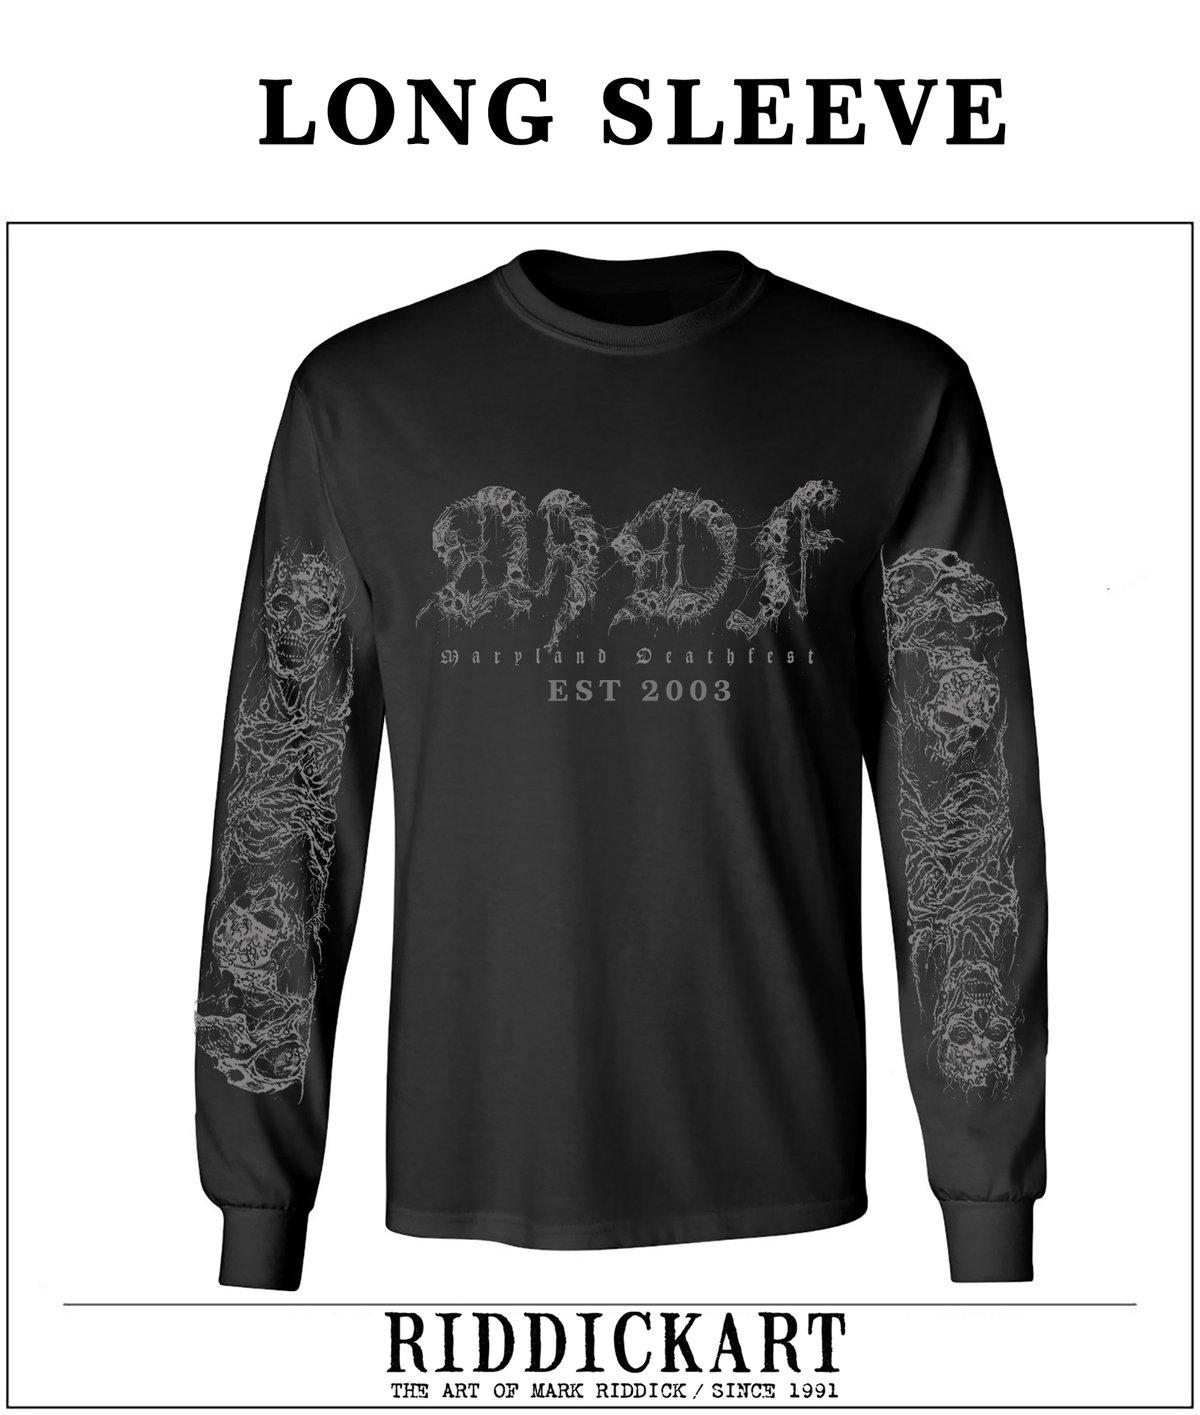 Maryland Deathfest Logo Long Sleeve Shirt - Riddick Design #2